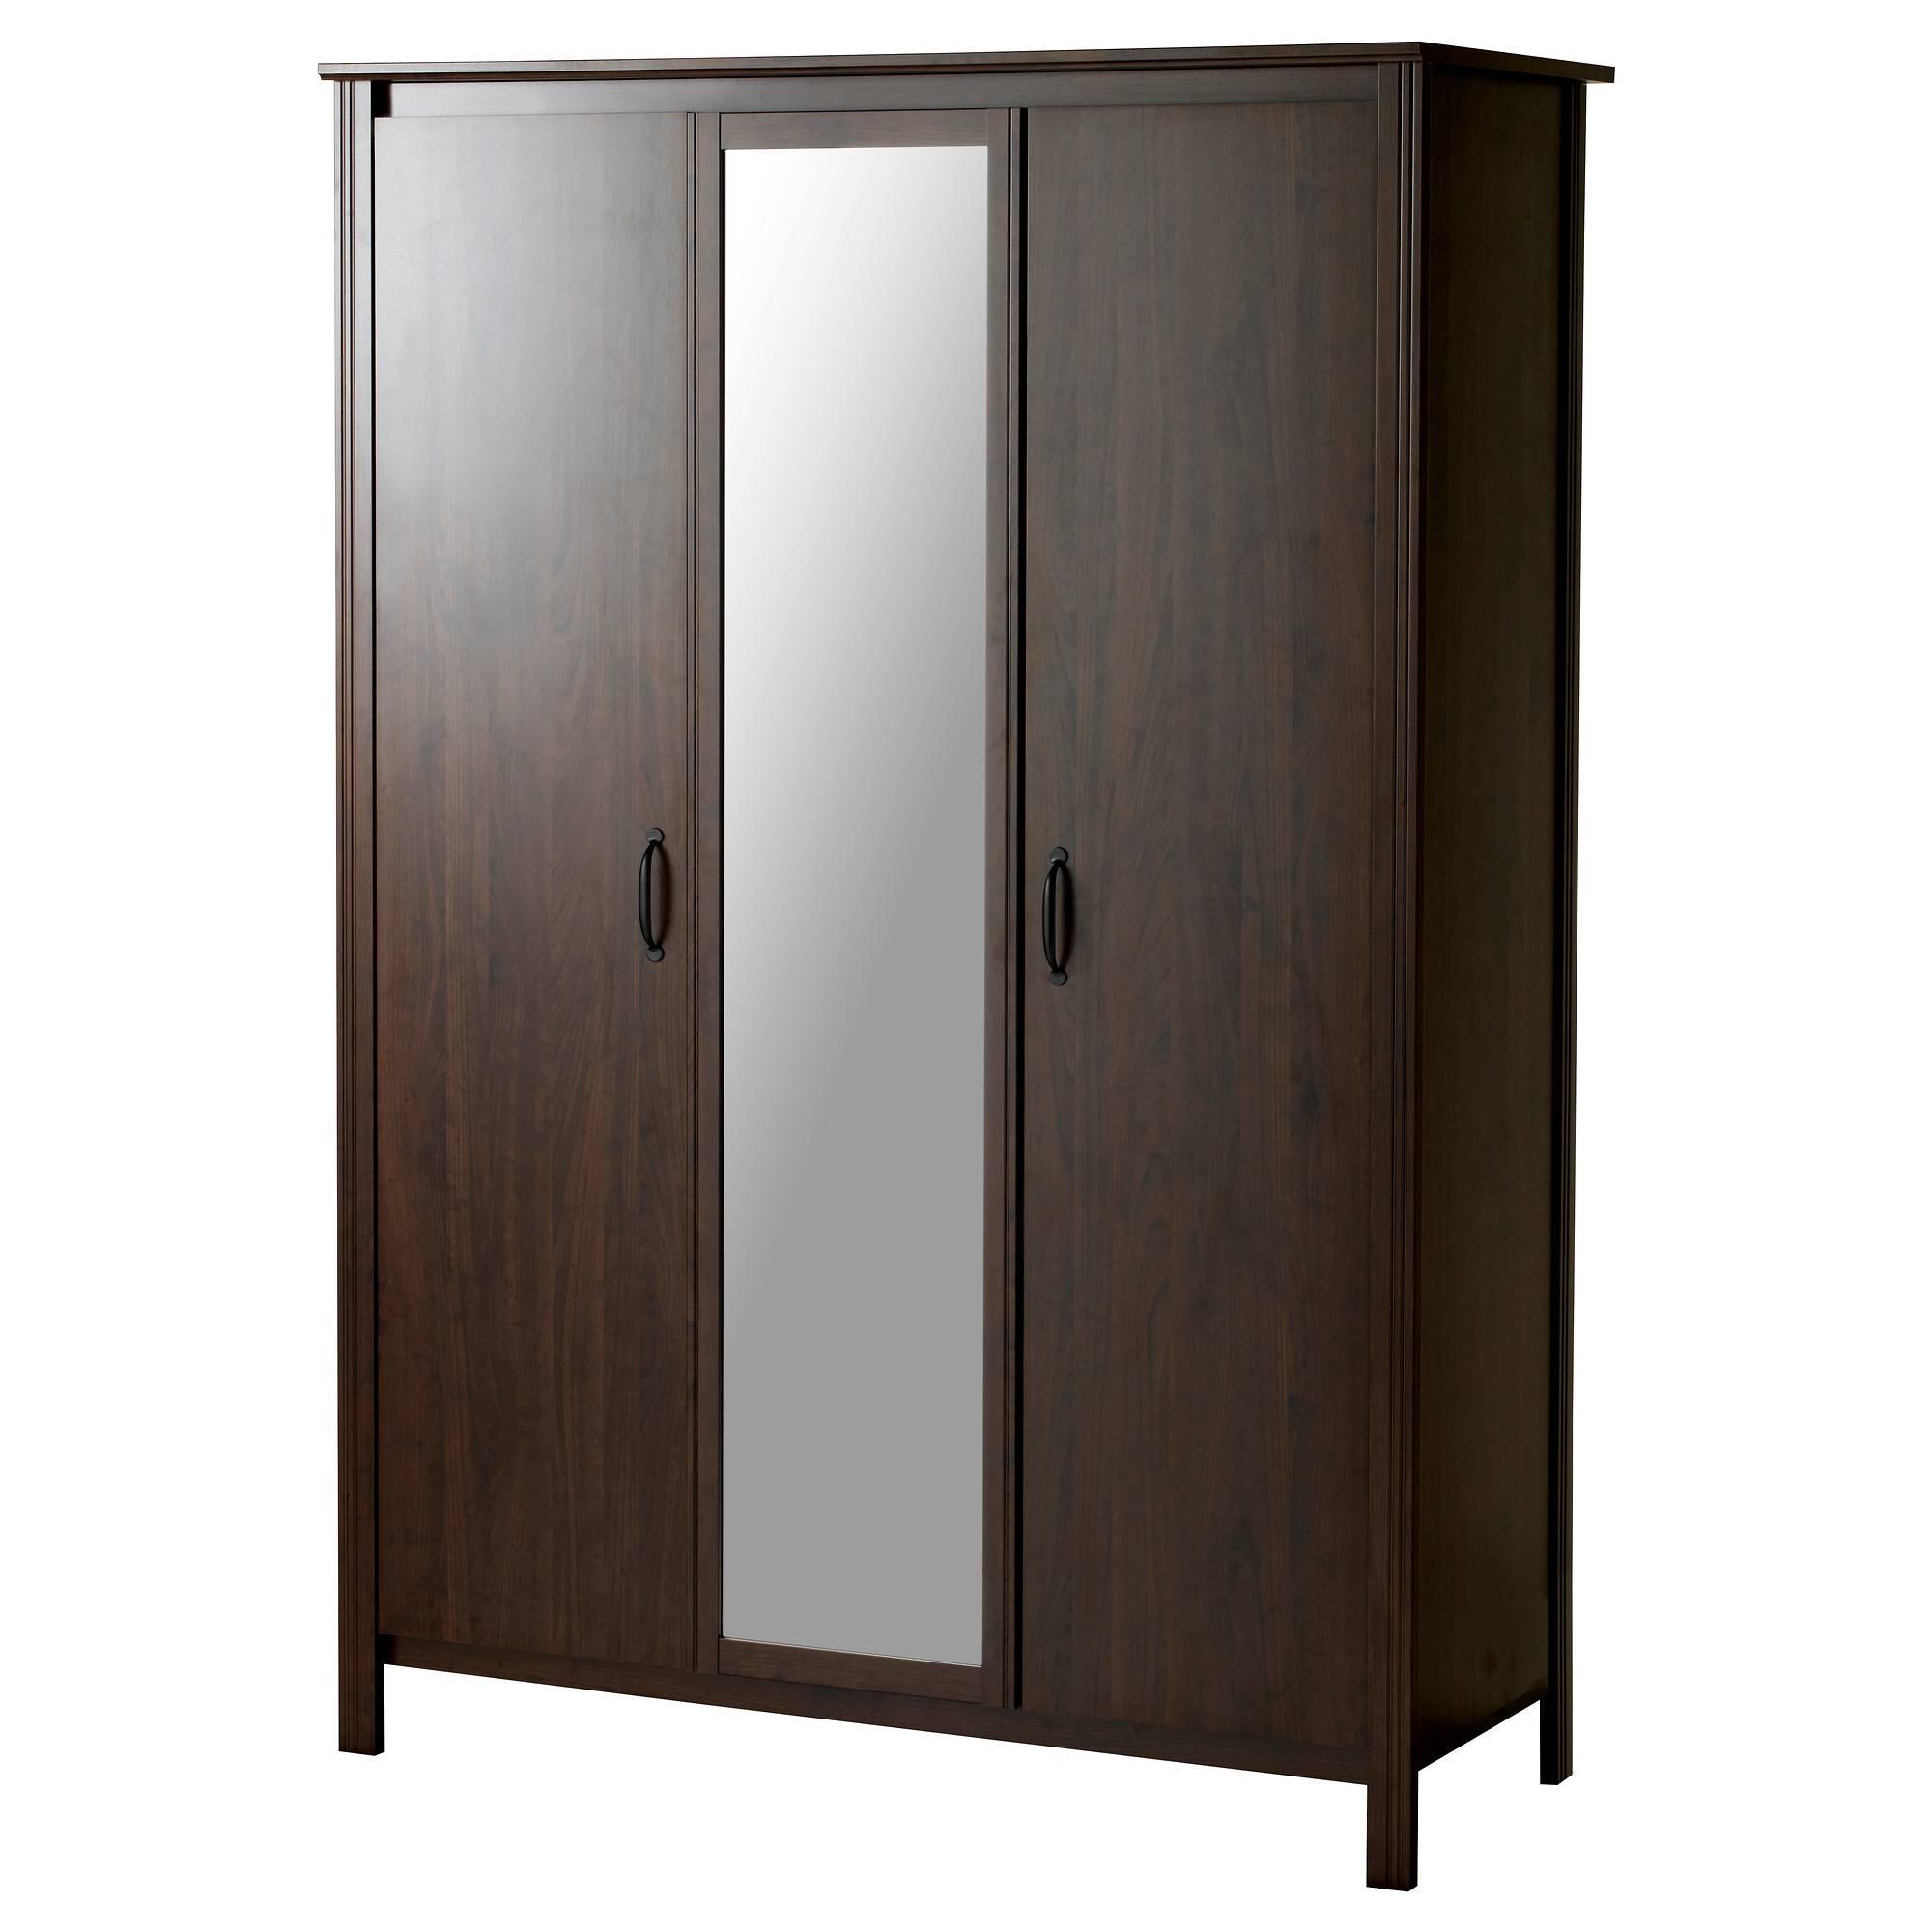 Wardrobes - Clothes Storage - Ikea with Dark Wood Wardrobes Ikea (Image 22 of 30)